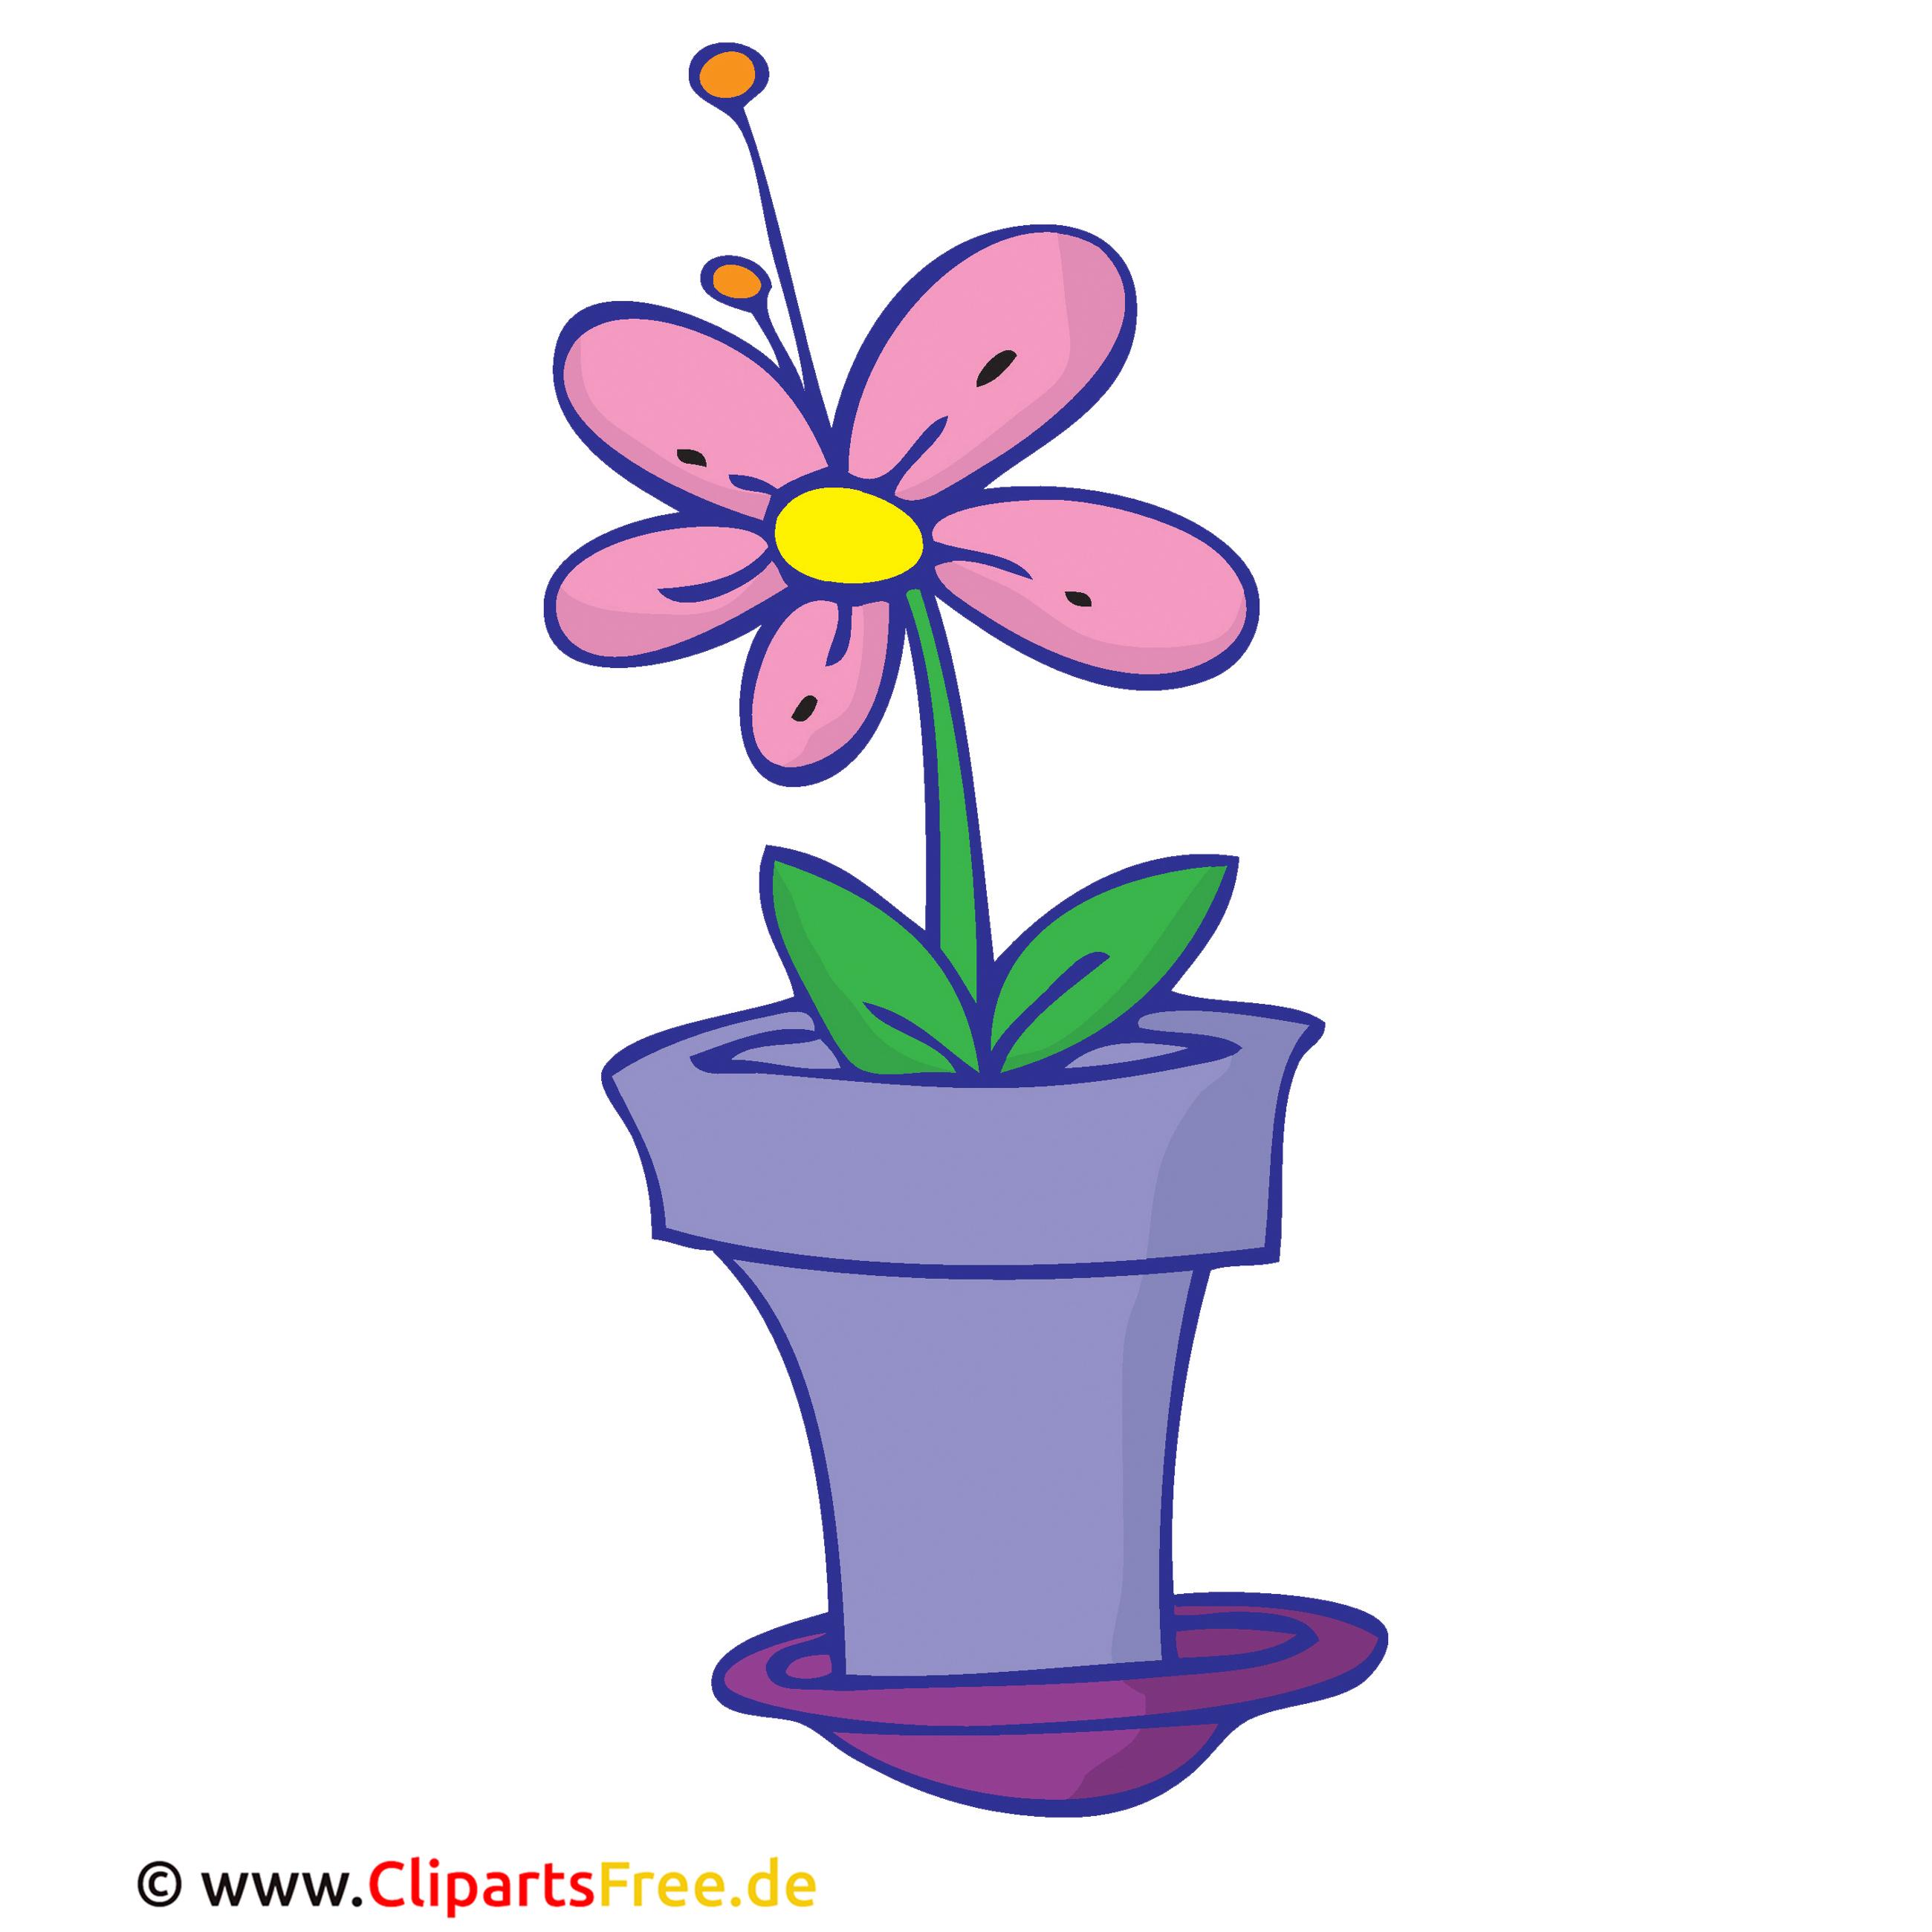 Blume im Topf Clipart, Bild, Cartoon, Grafik, Illustration